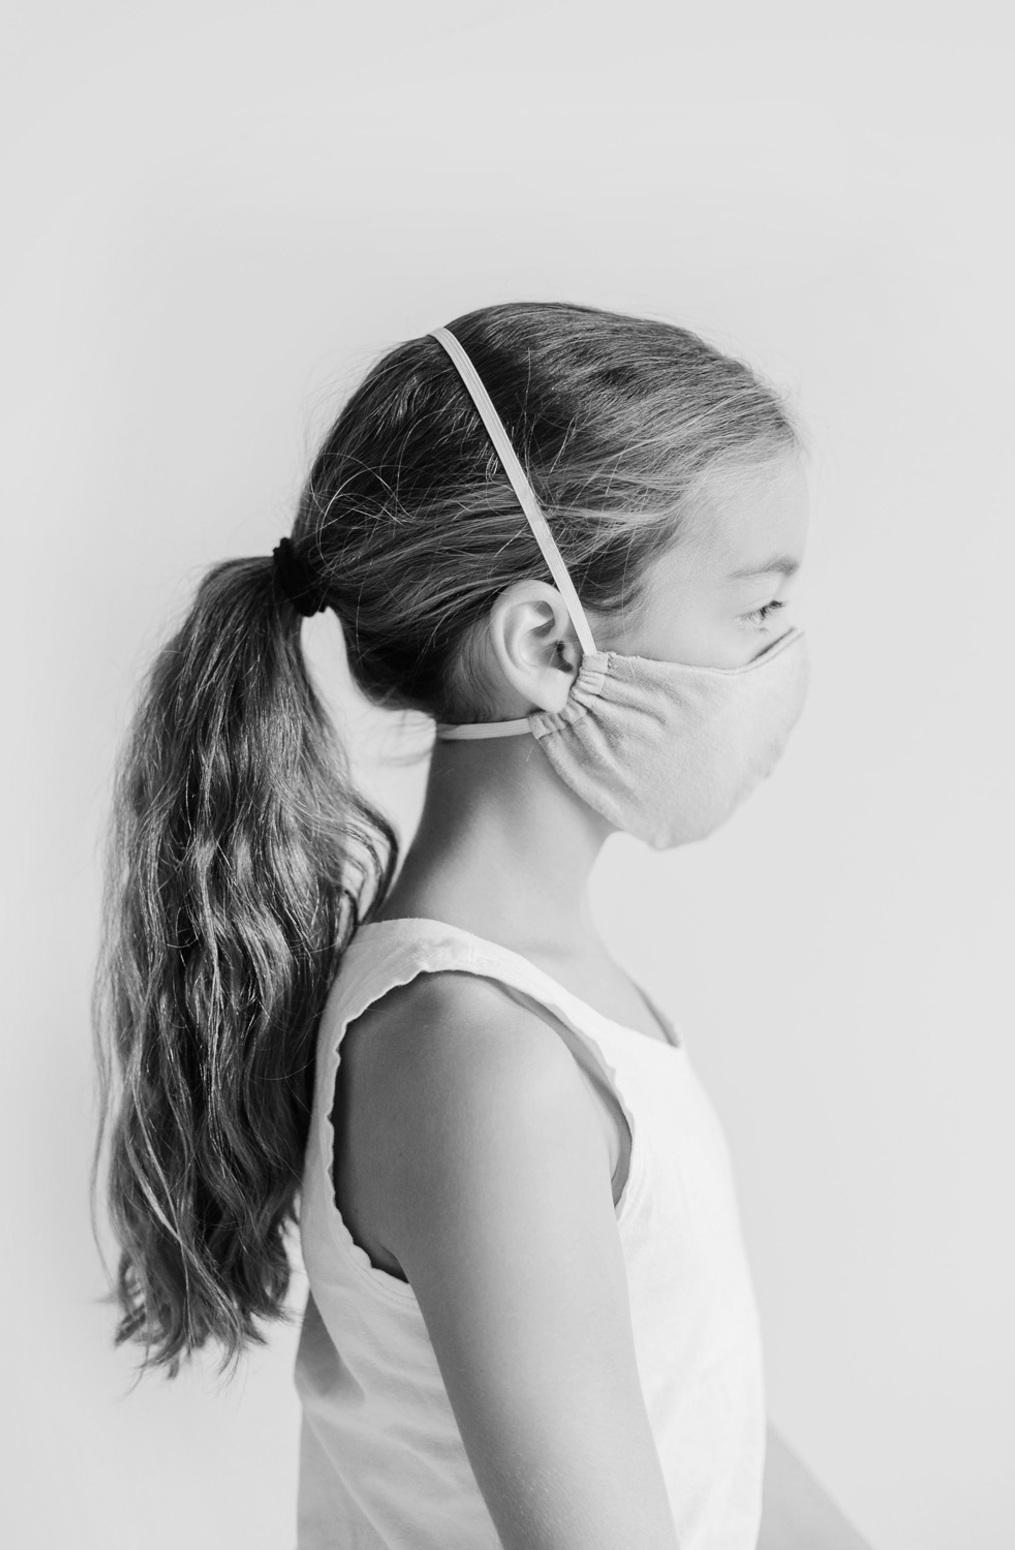 Alabama chanin  organic cotton  childrens reusable face mask  durable  washable